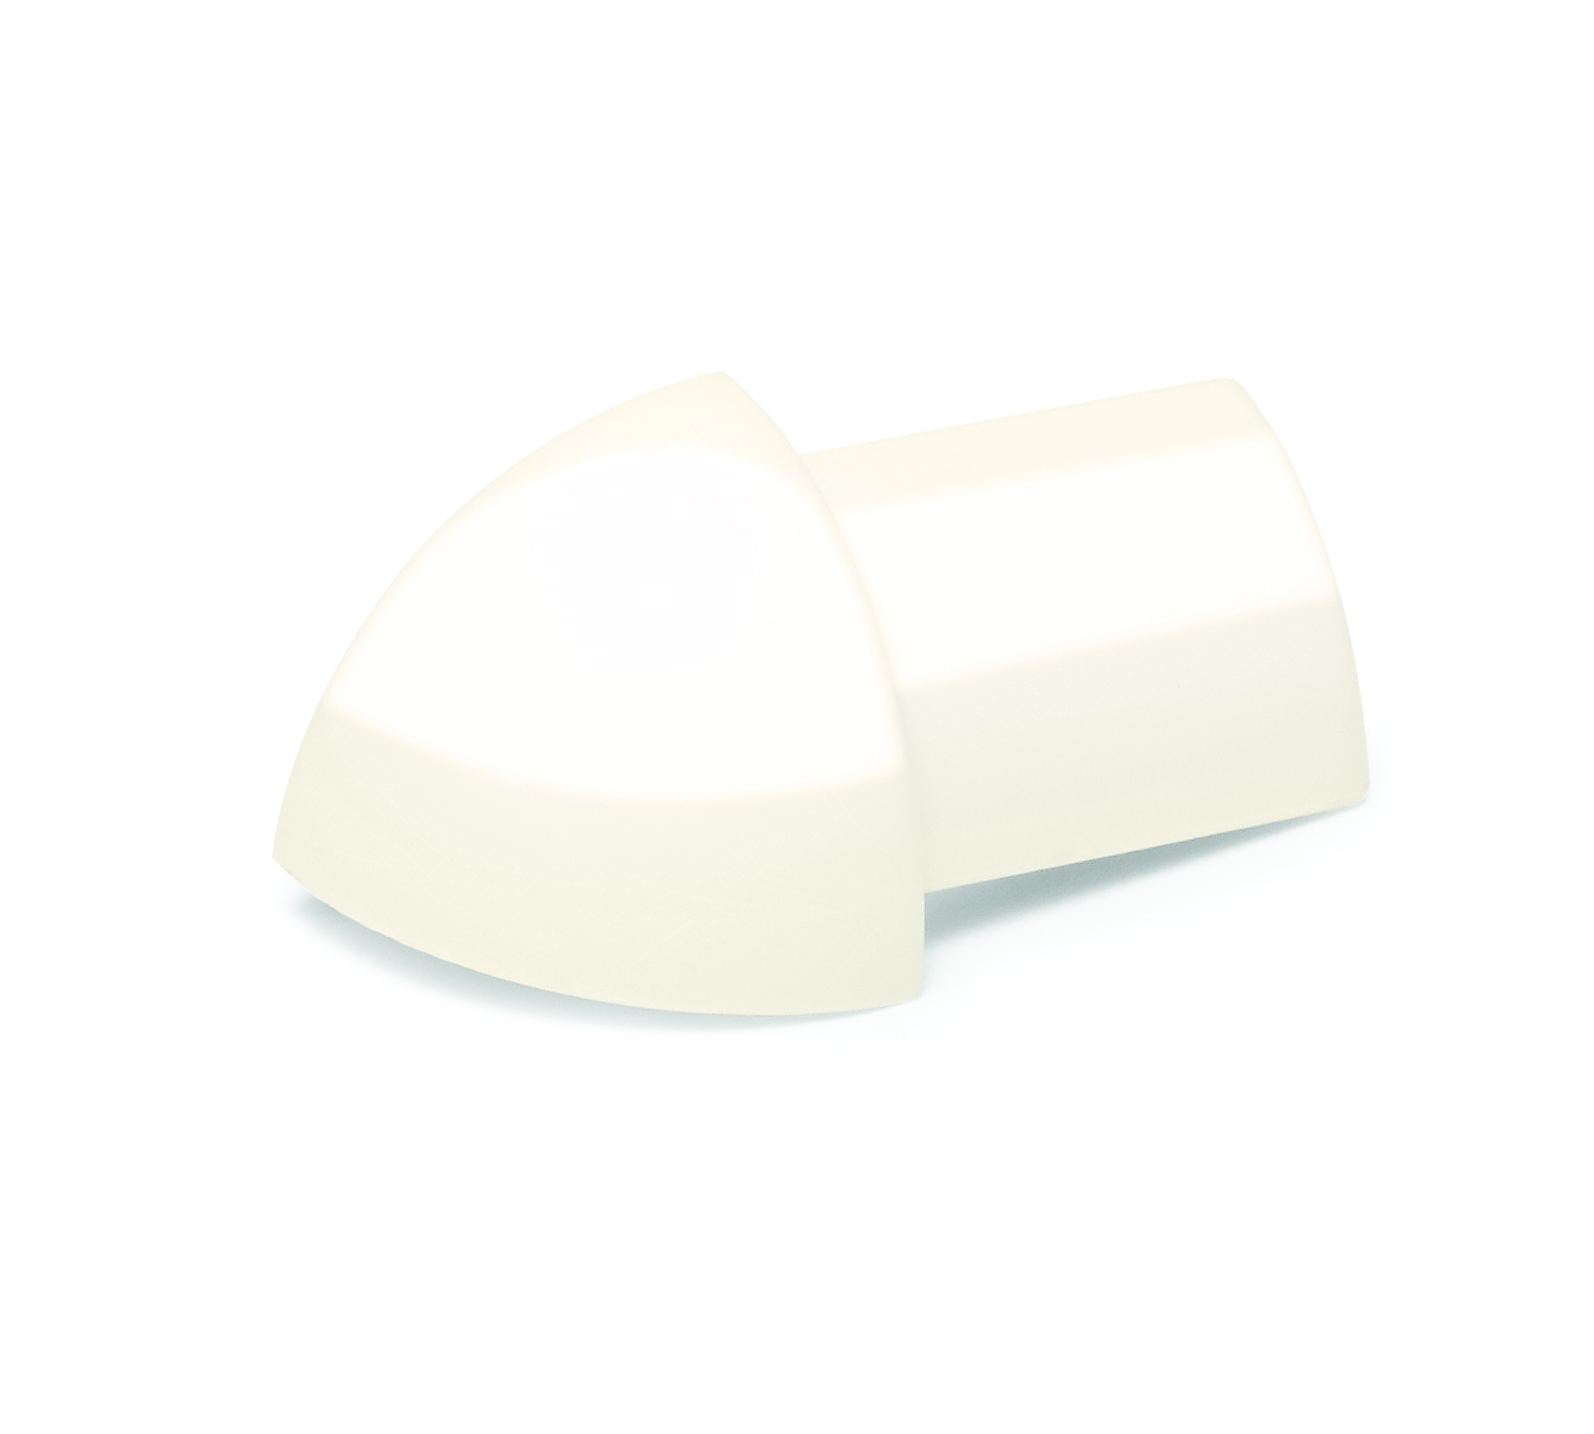 6mm Soft Cream Supergloss PVC Quadrant Corners